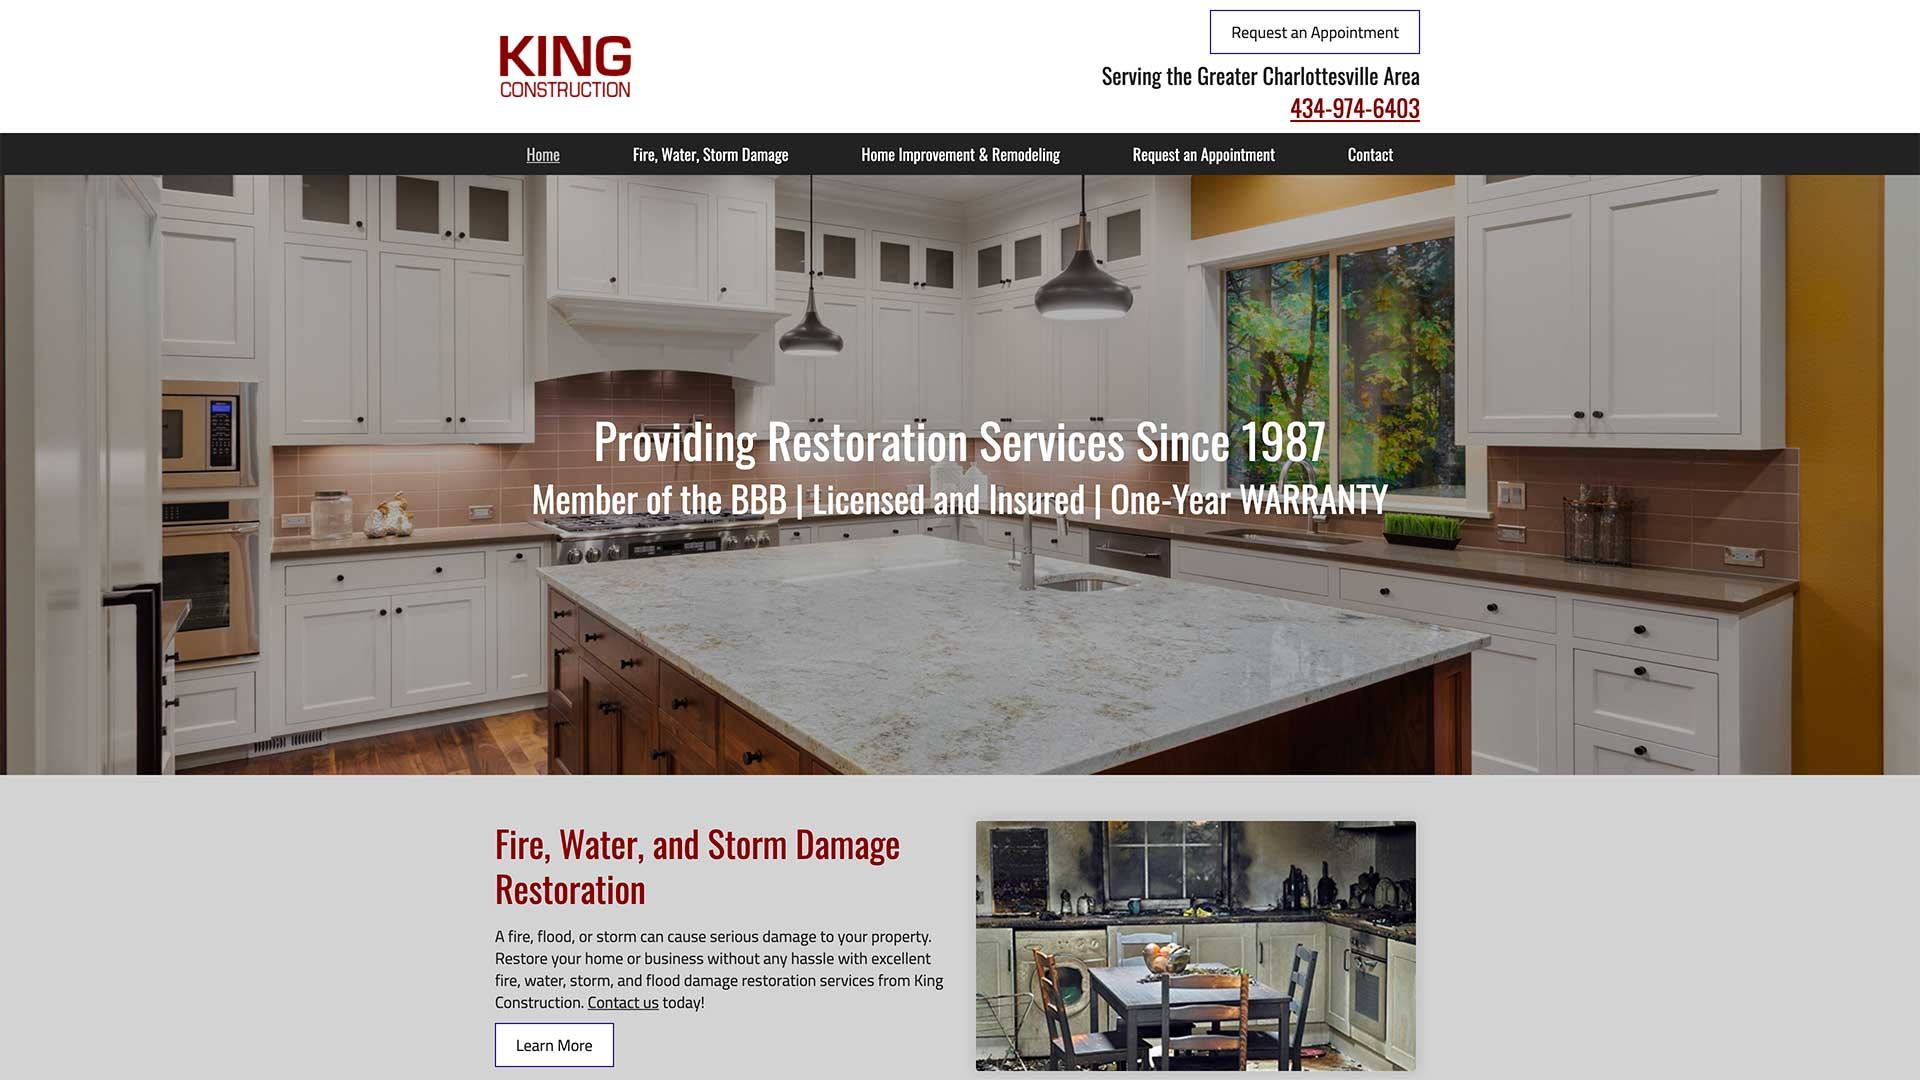 King Construction